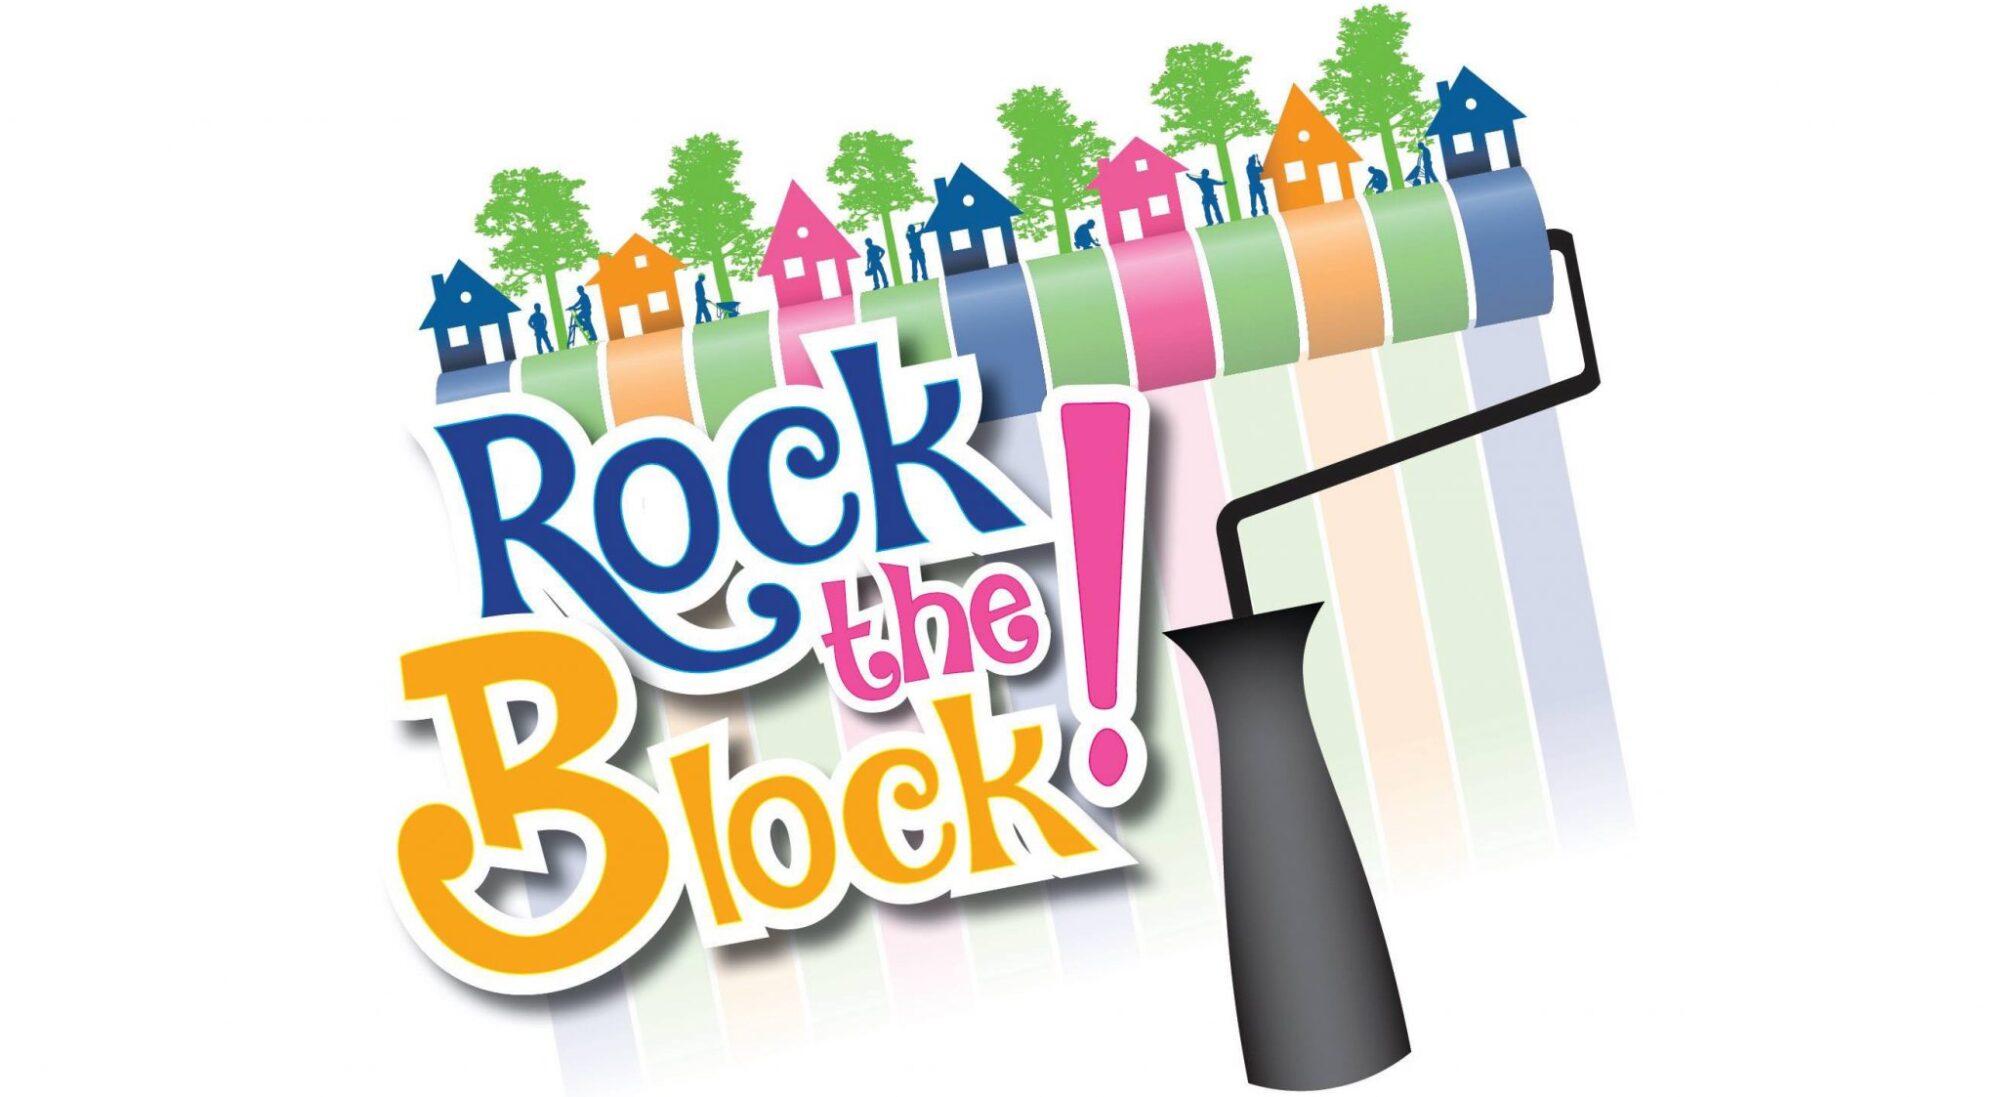 Rock the Block – New Neighborhood To Be Announced